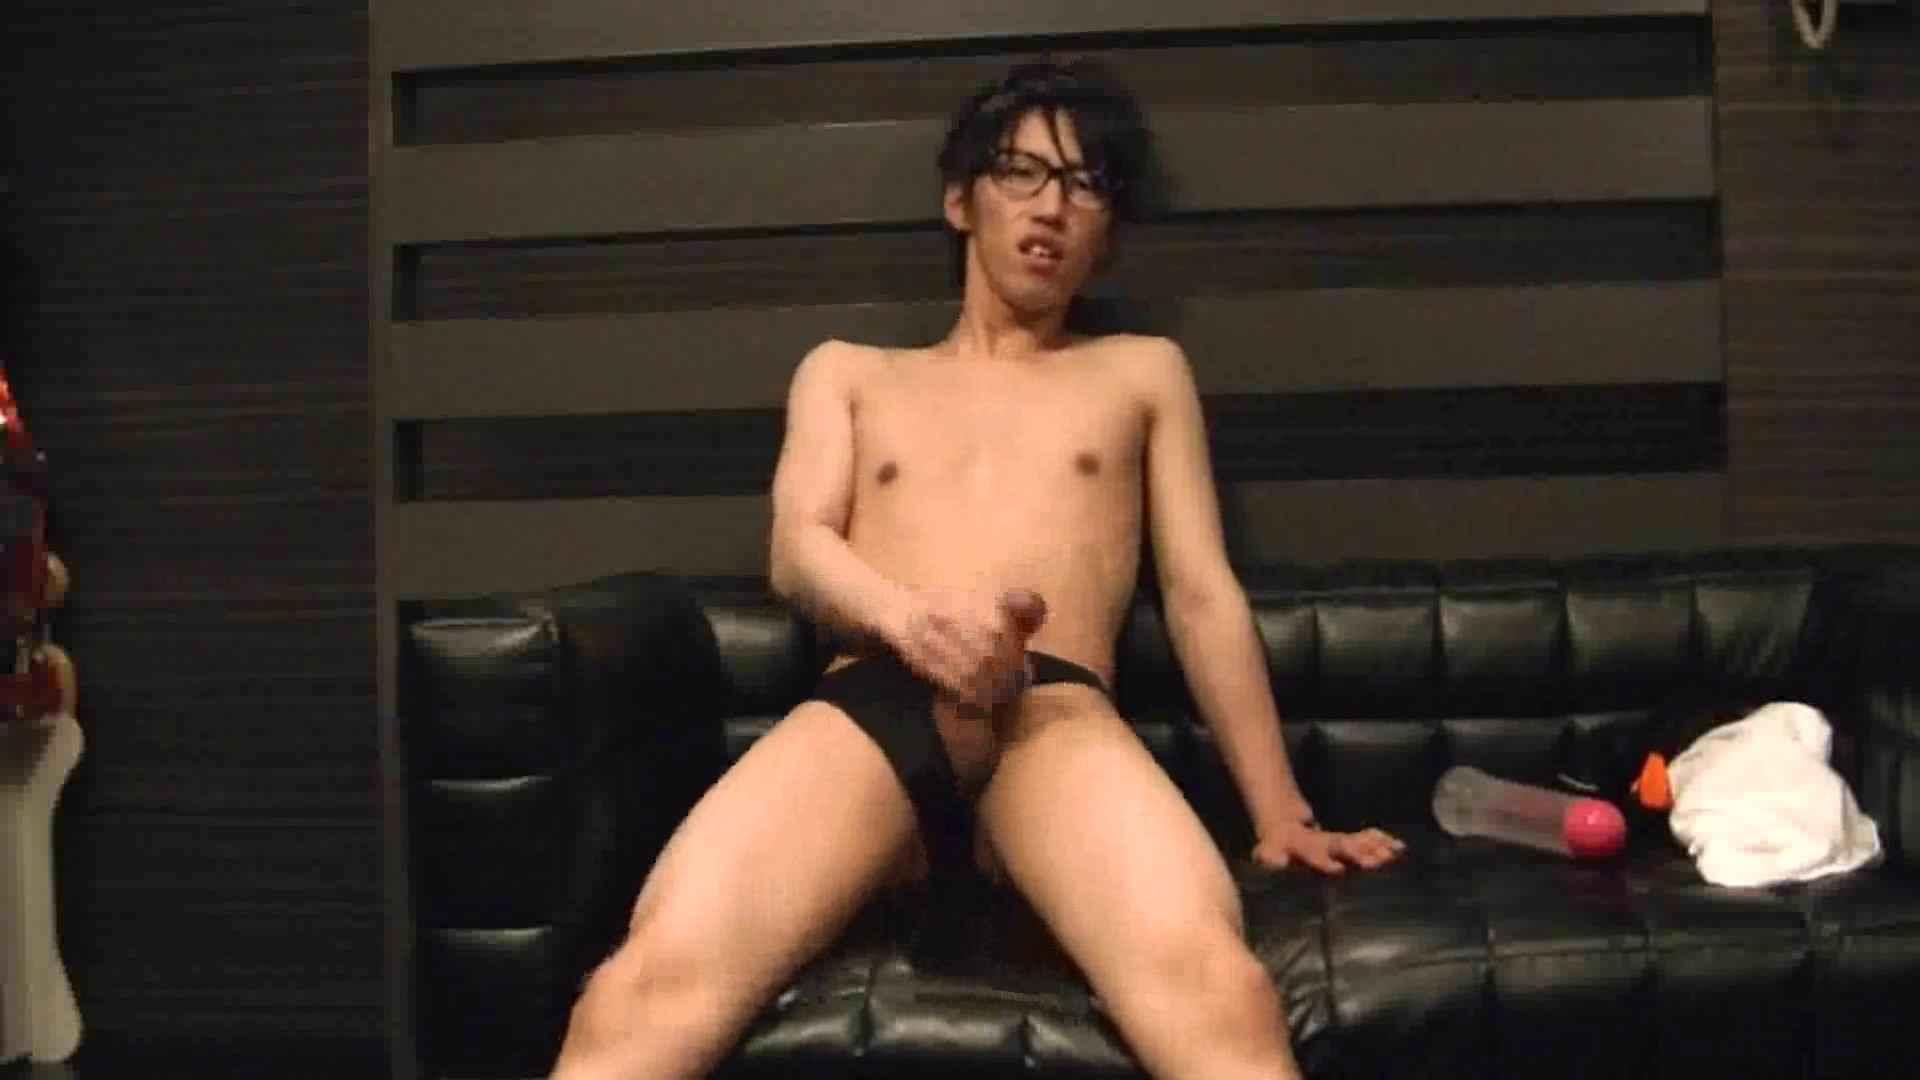 ONA見せカーニバル!! Vol3 男 ゲイ無料無修正画像 89枚 88